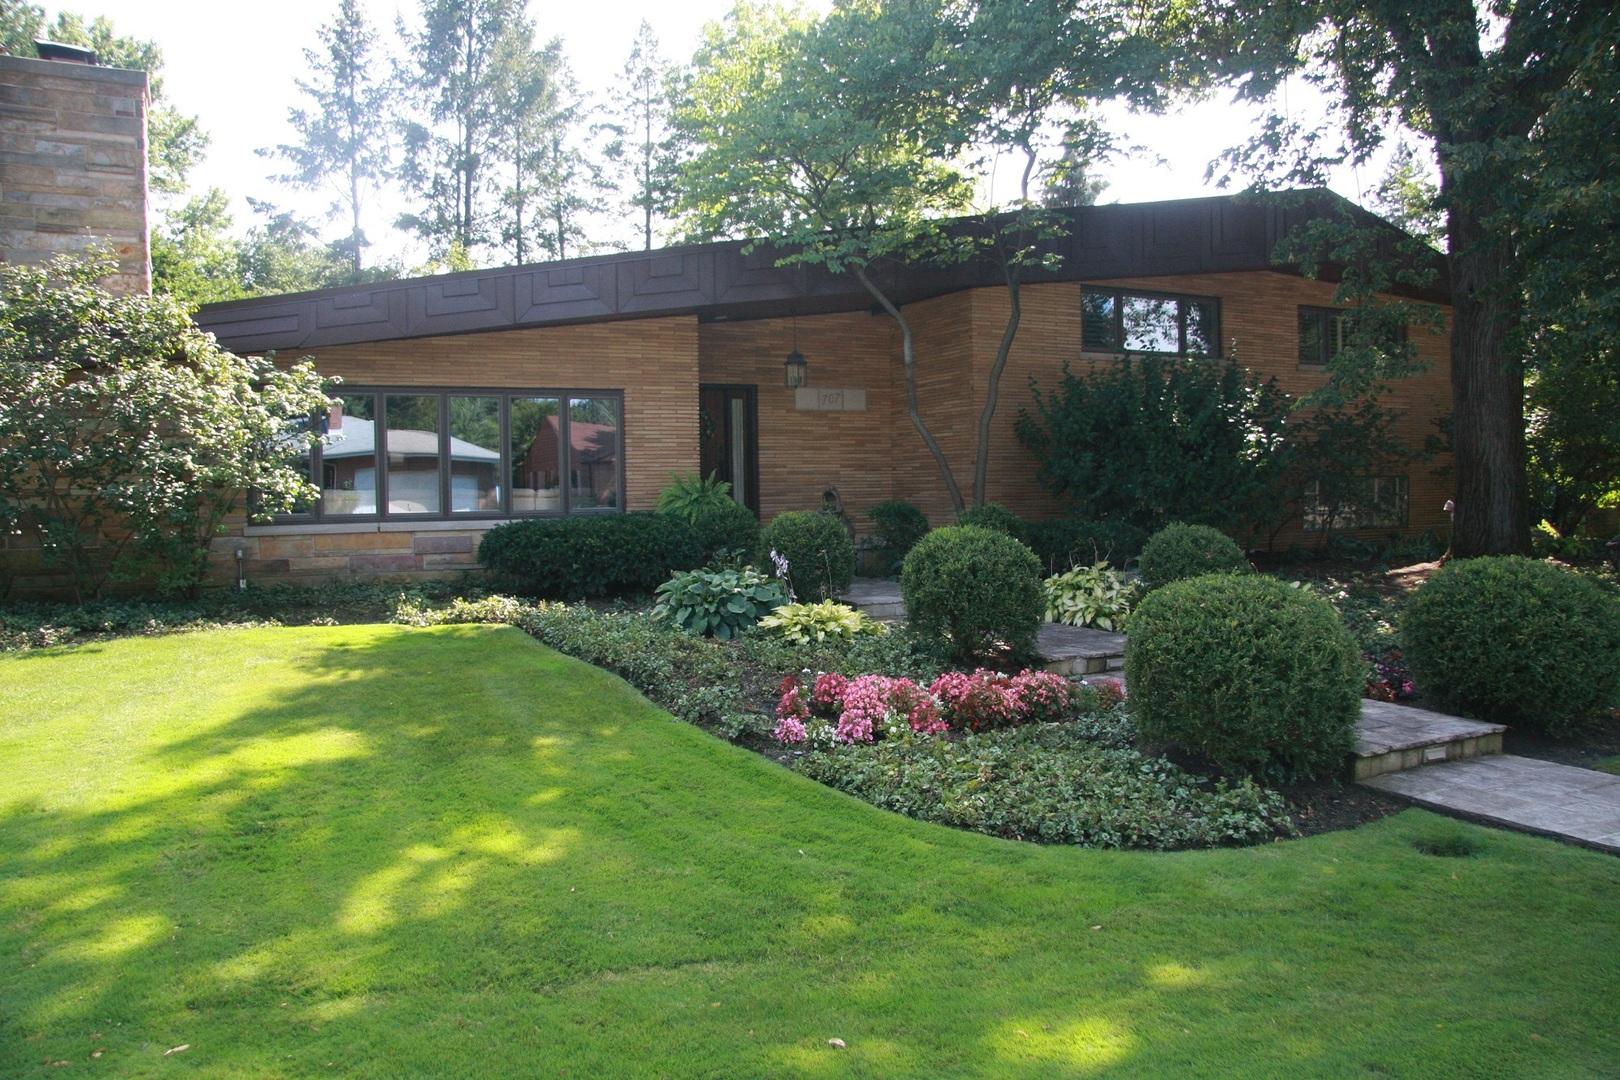 707 Edgemont Lane Park Ridge, IL 60068